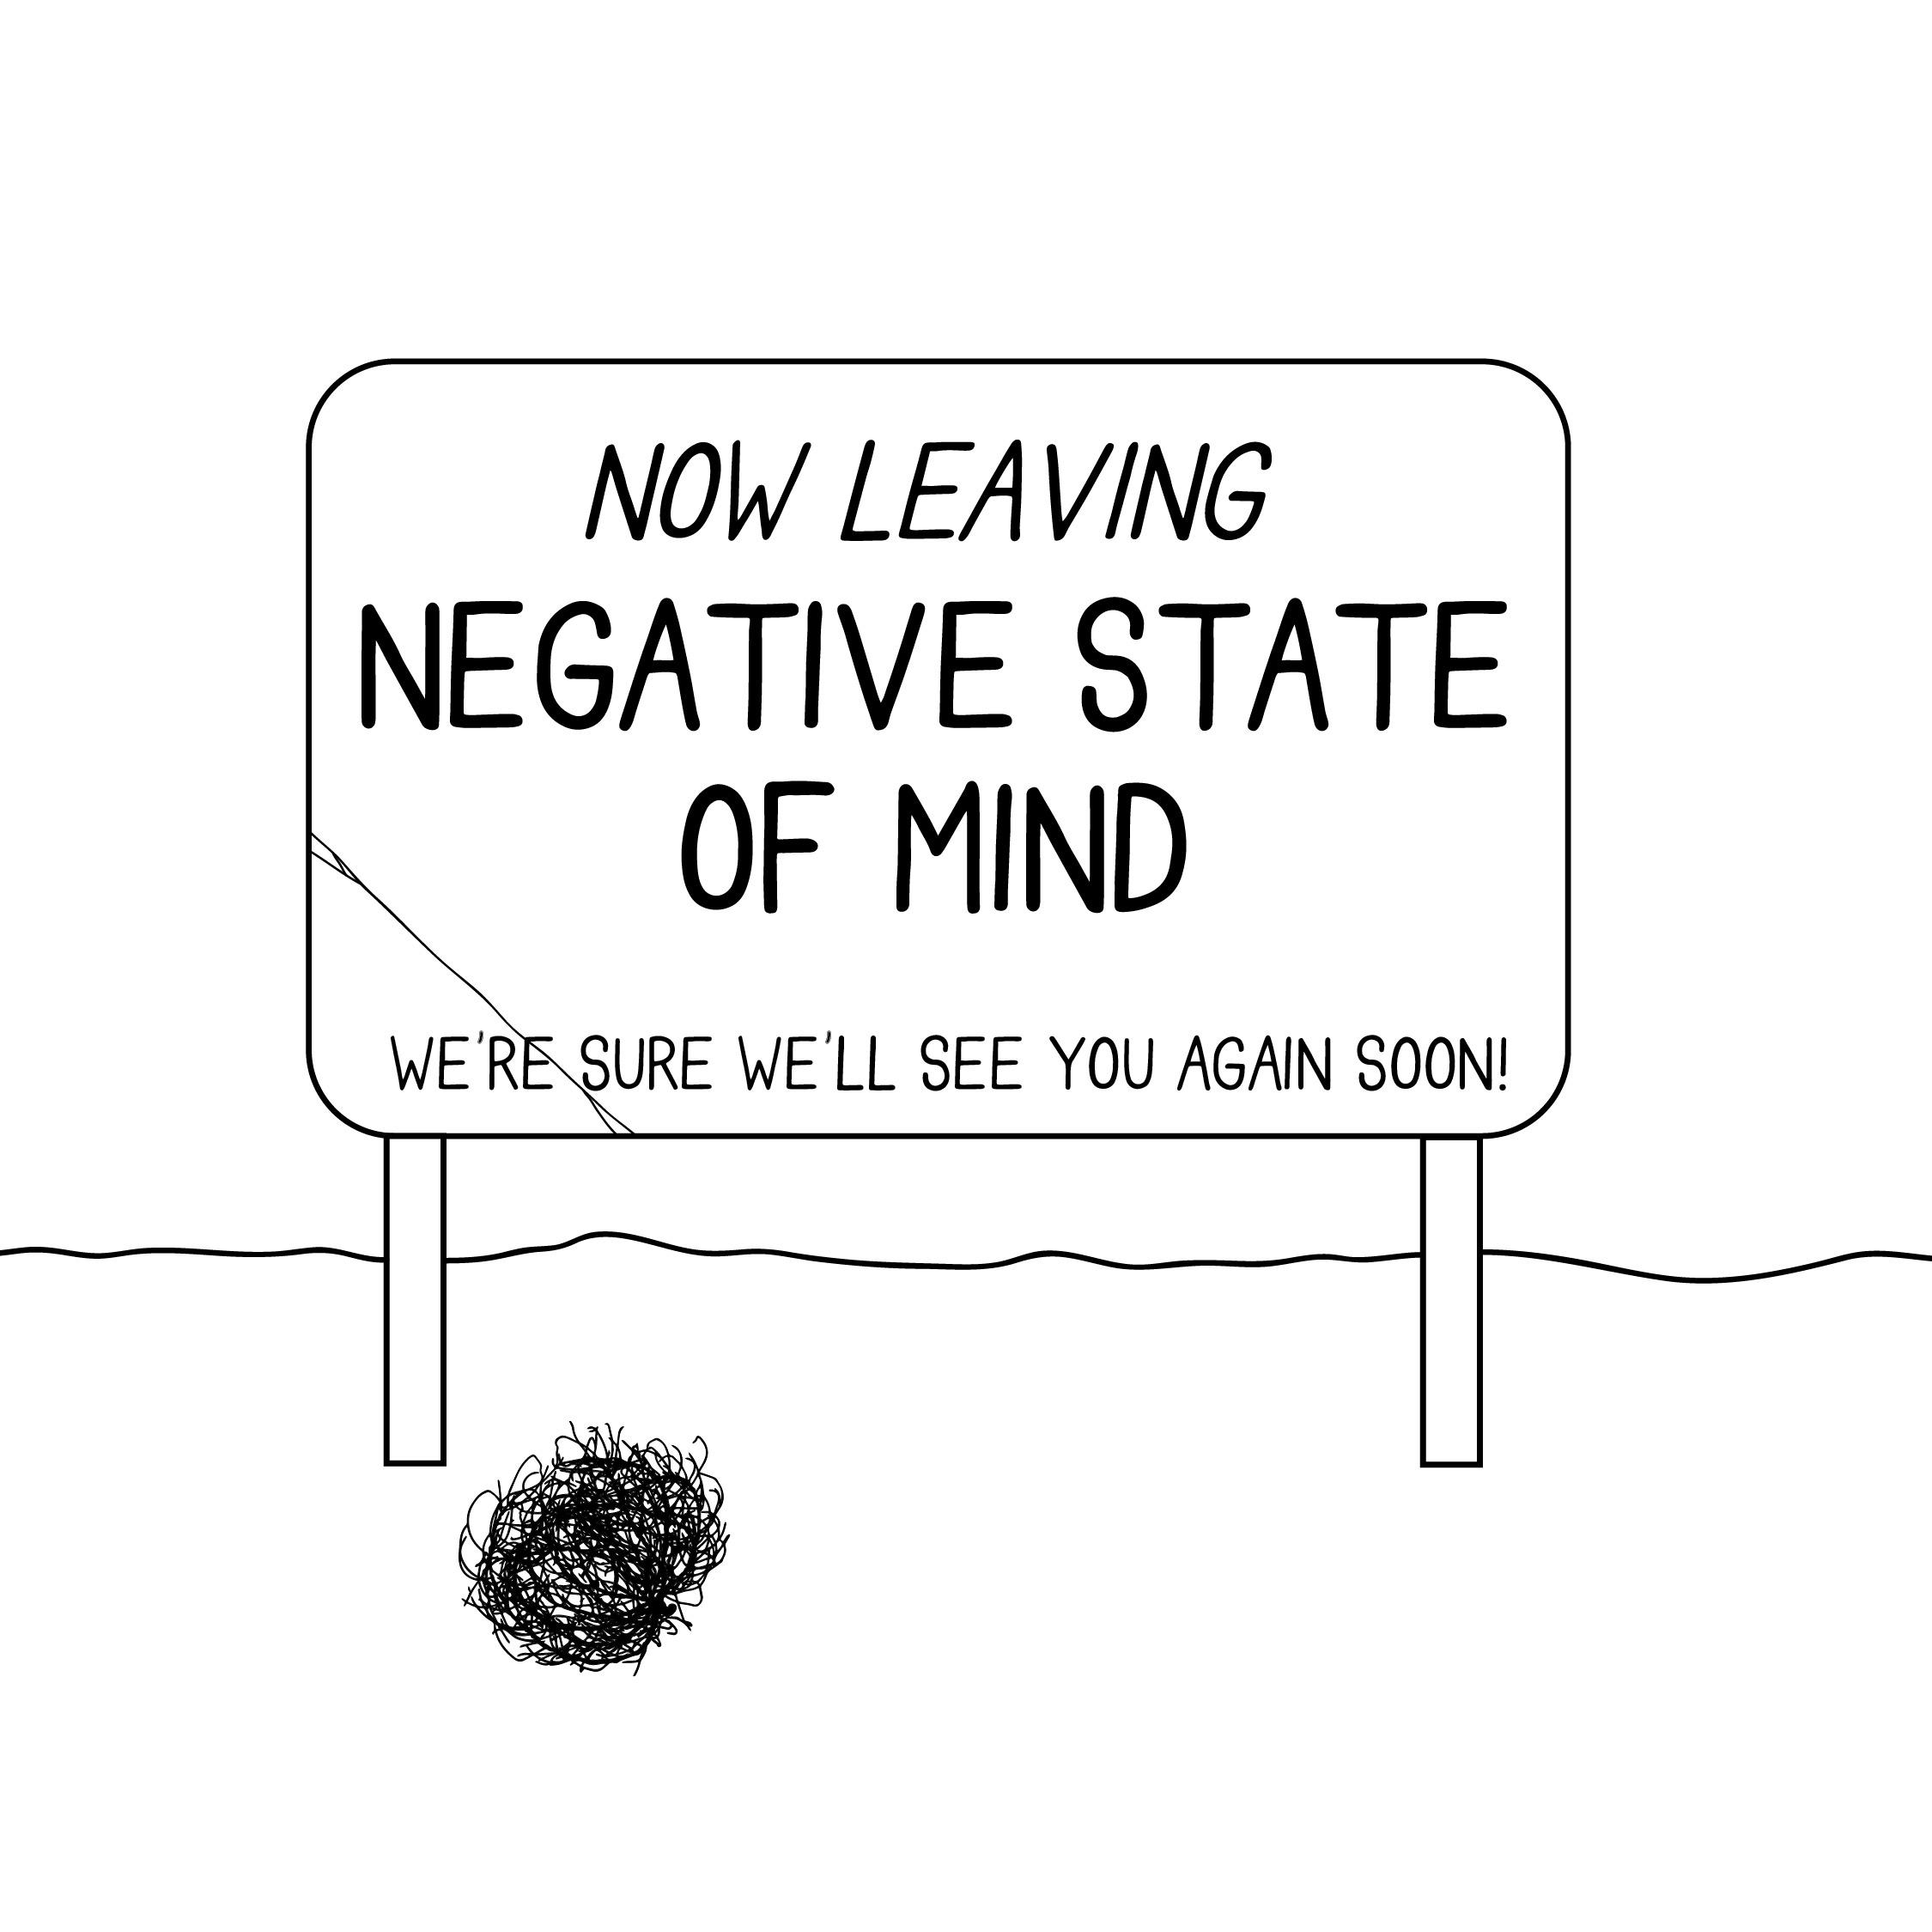 negativemindstate-01.jpg